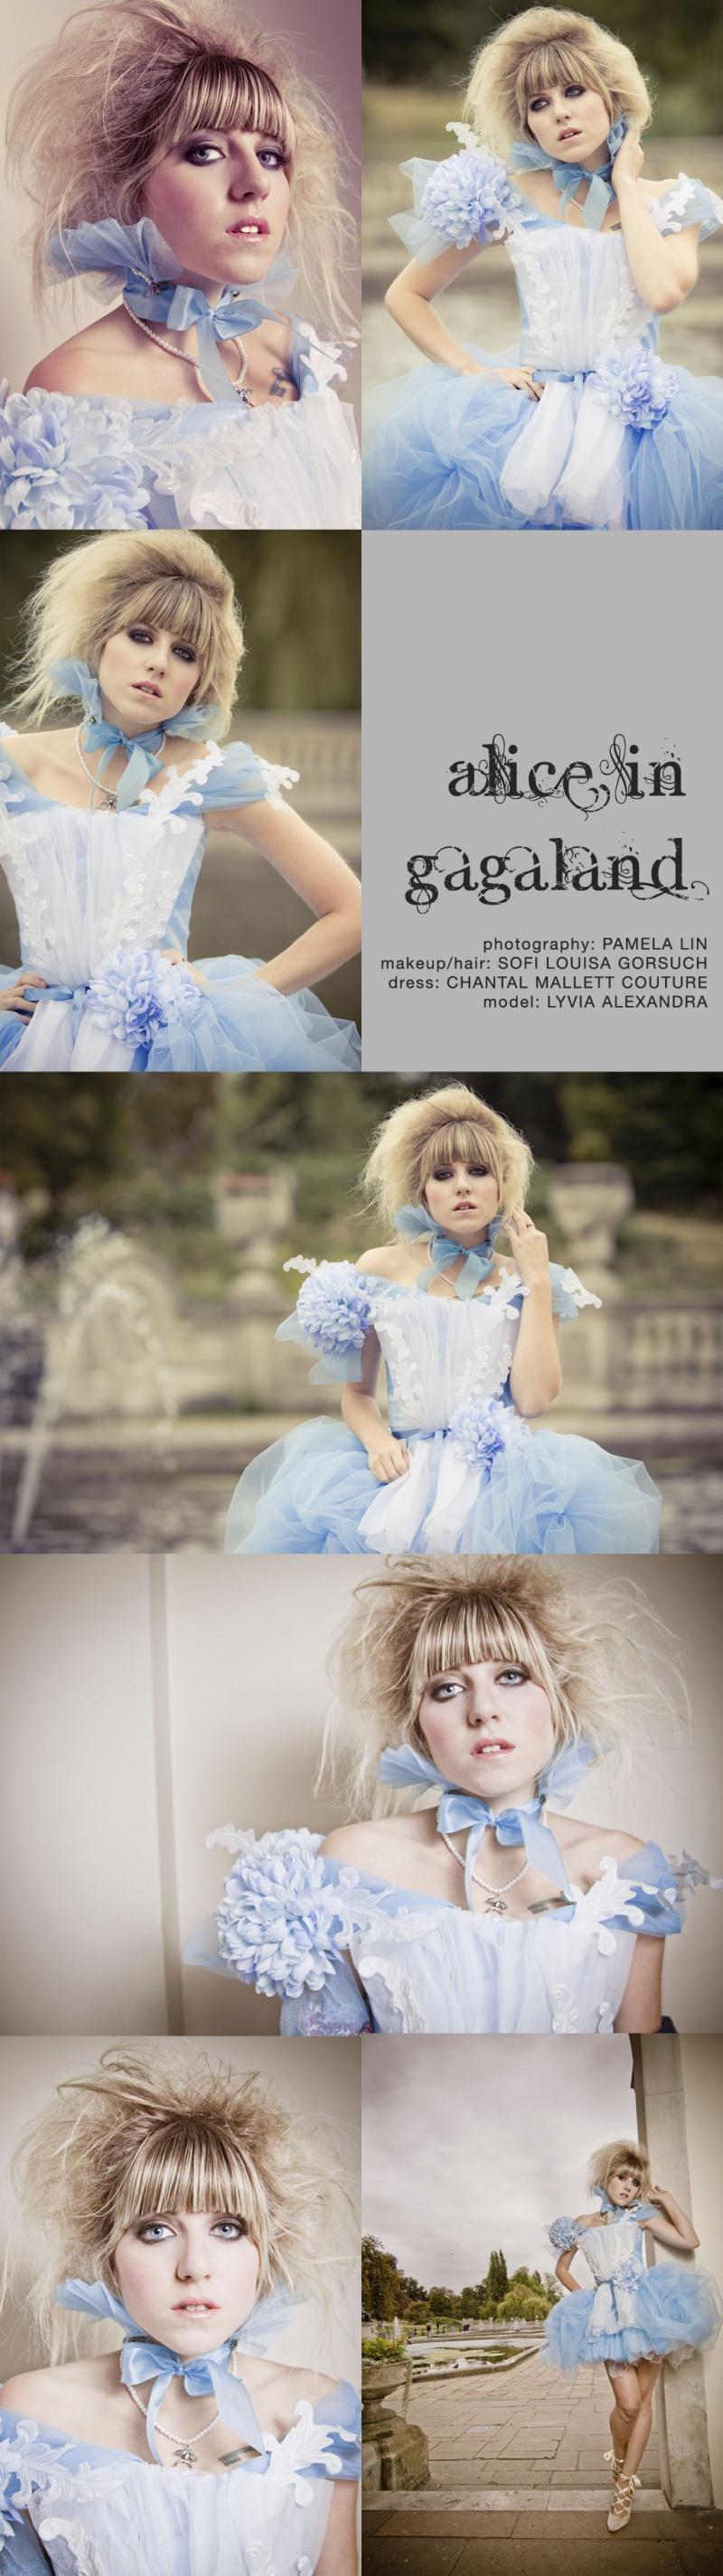 Female model photo shoot of Pamela Lin Photography in London